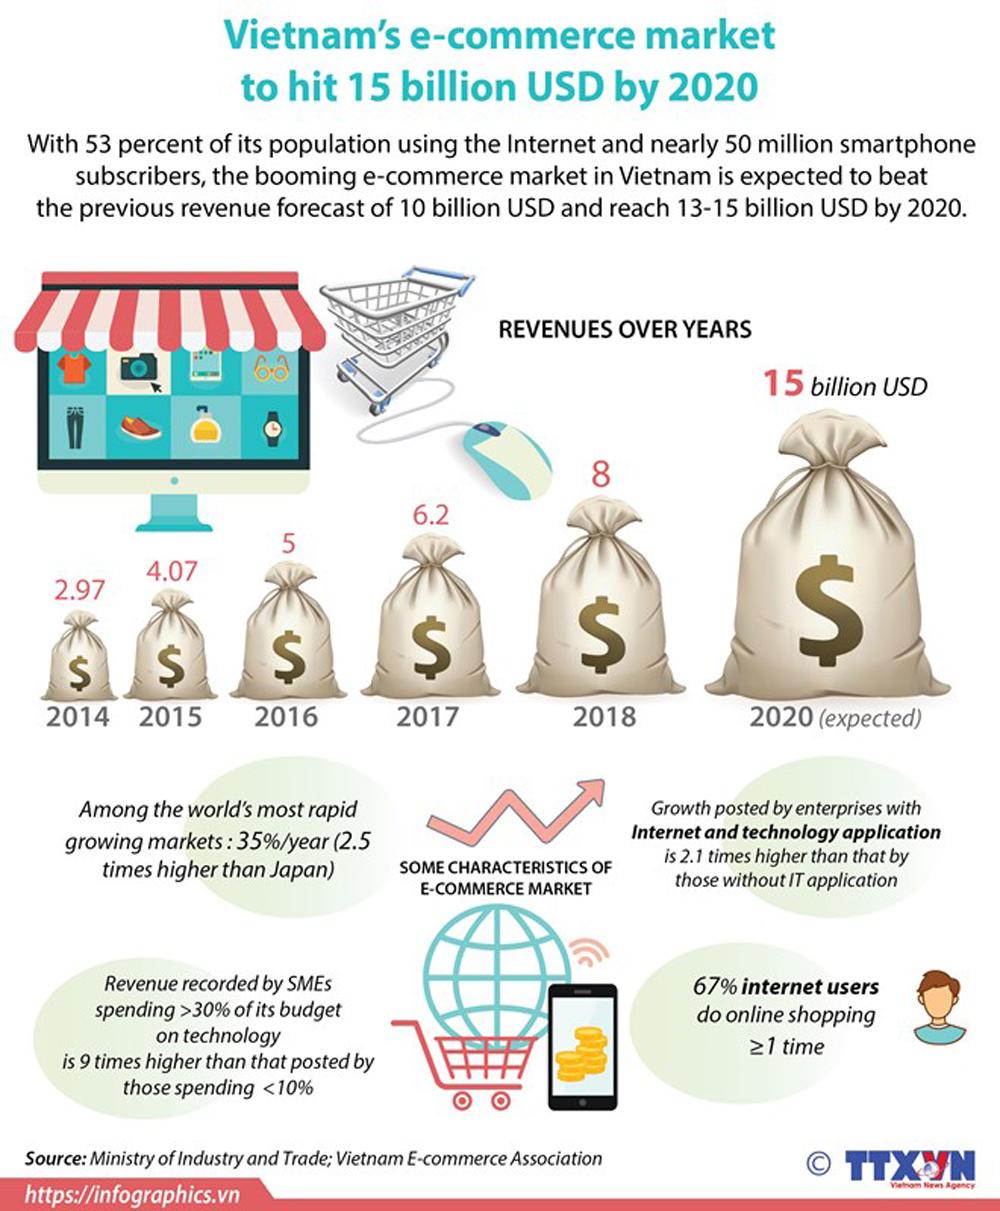 Vietnam, e-commerce market,  Internet users, smartphone subcribers, online shopping